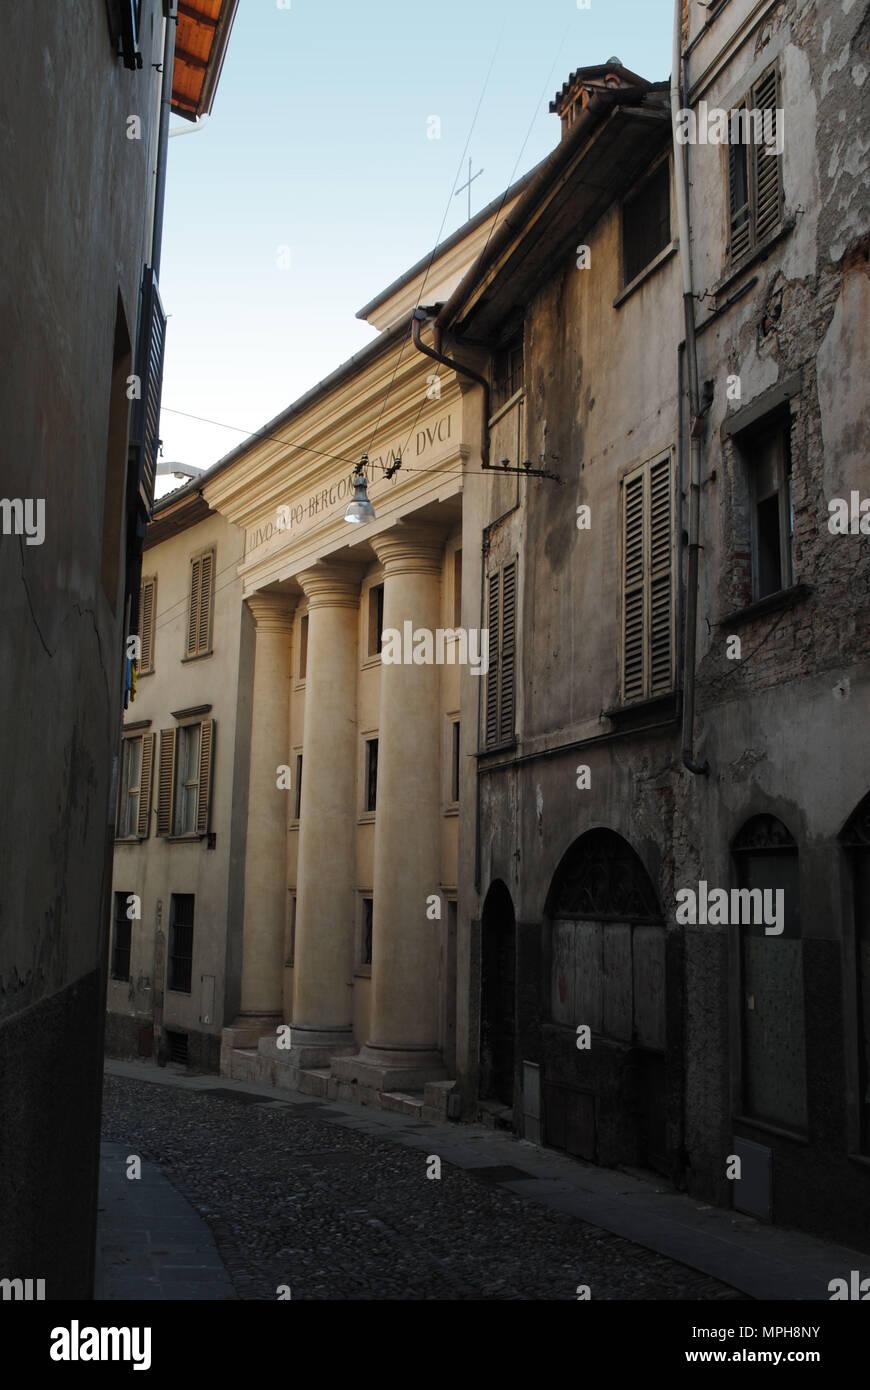 Street View in Bergamo die mittelalterliche Altstadt. Stockbild